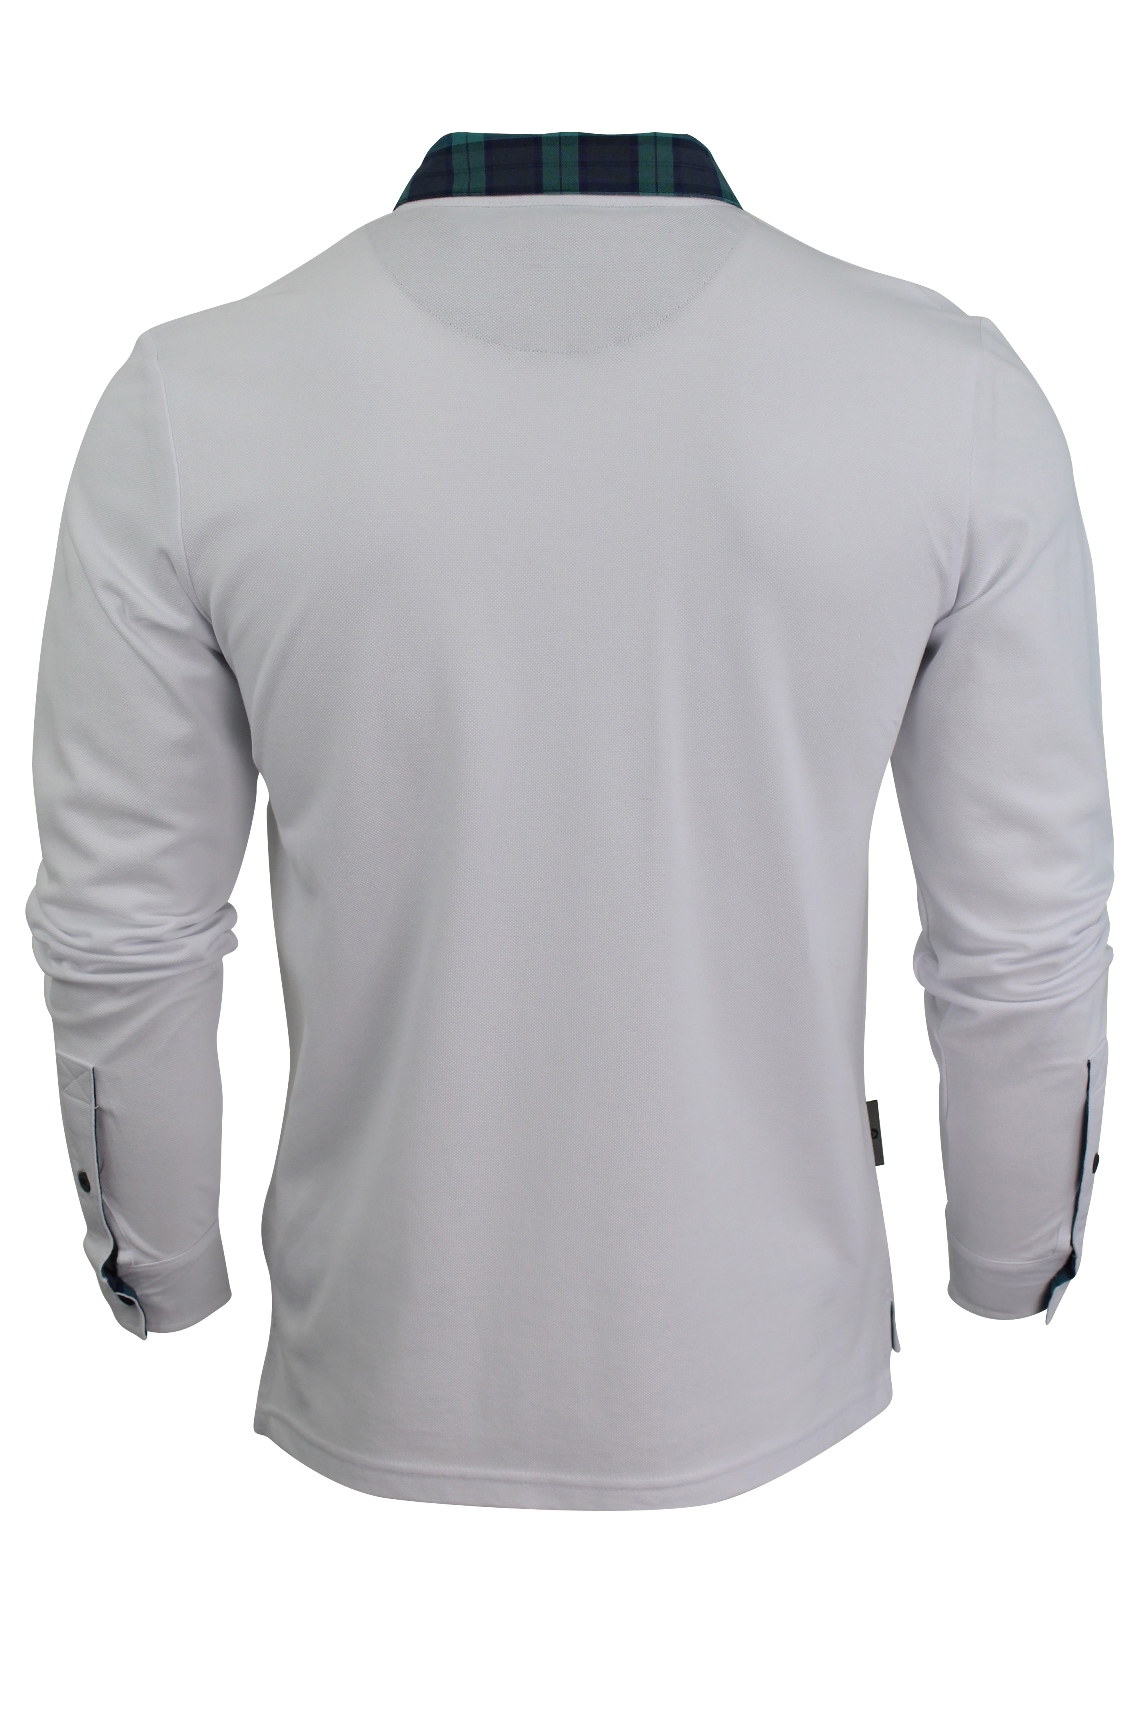 Camisa-Polo-para-hombre-por-Voi-Jeans-039-Rory-039-Manga-Larga miniatura 8